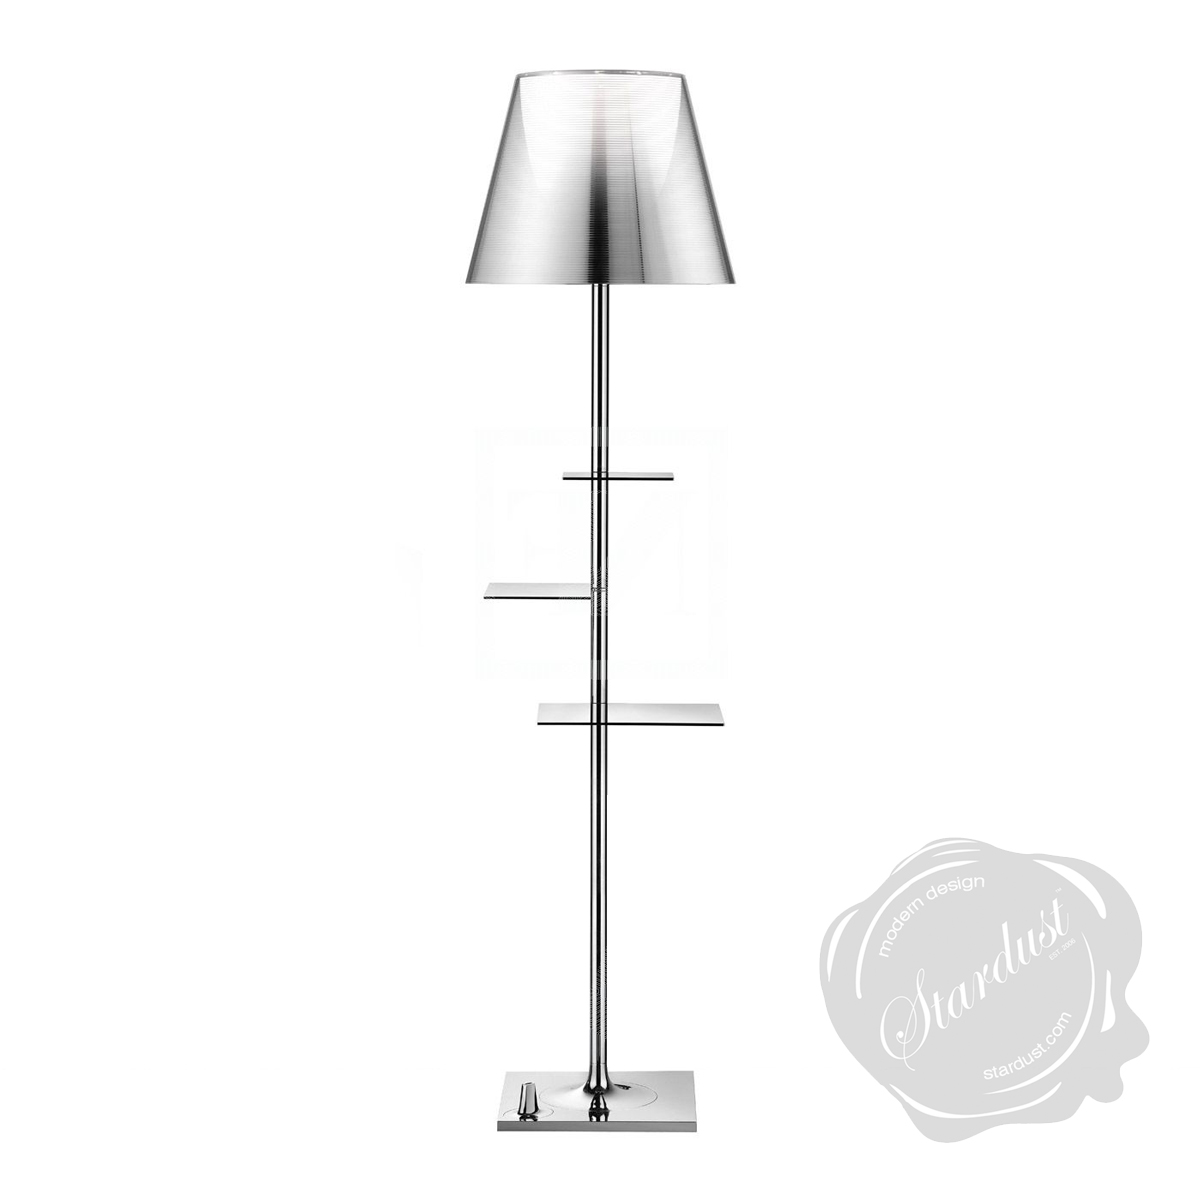 bibliotheque nationale floor lamp by flos lighting. Black Bedroom Furniture Sets. Home Design Ideas